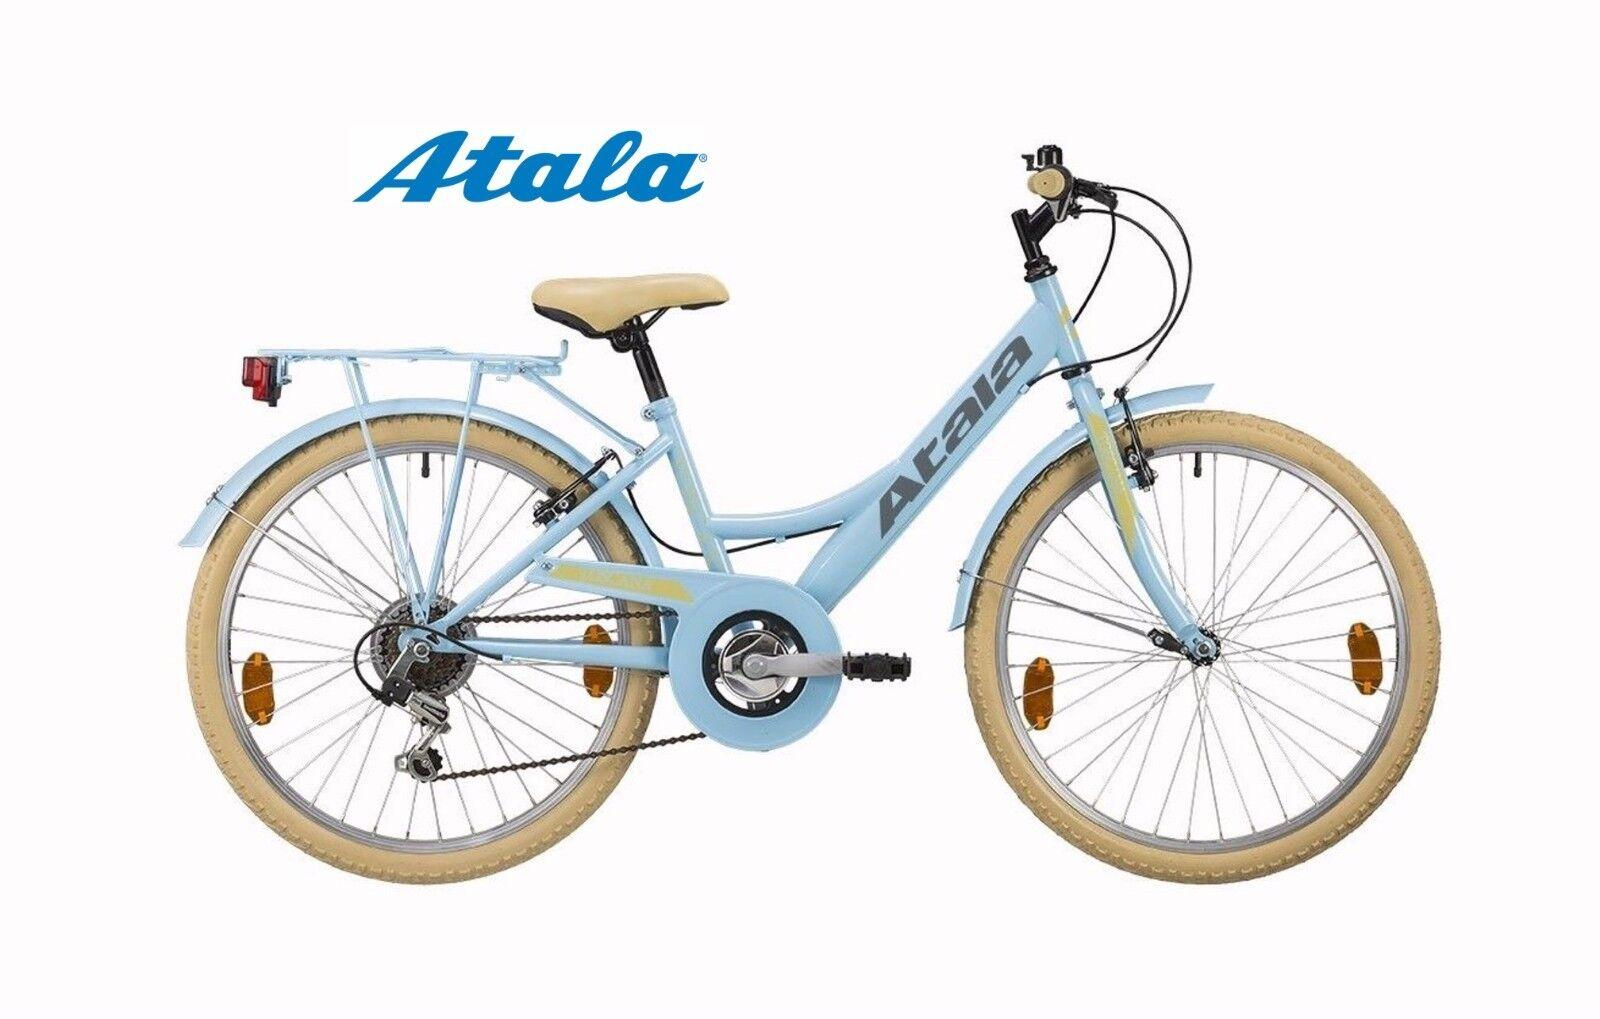 Bicycle Atala Toscana 24'' Shifter Shimano 6v. Holland City Bike 2019